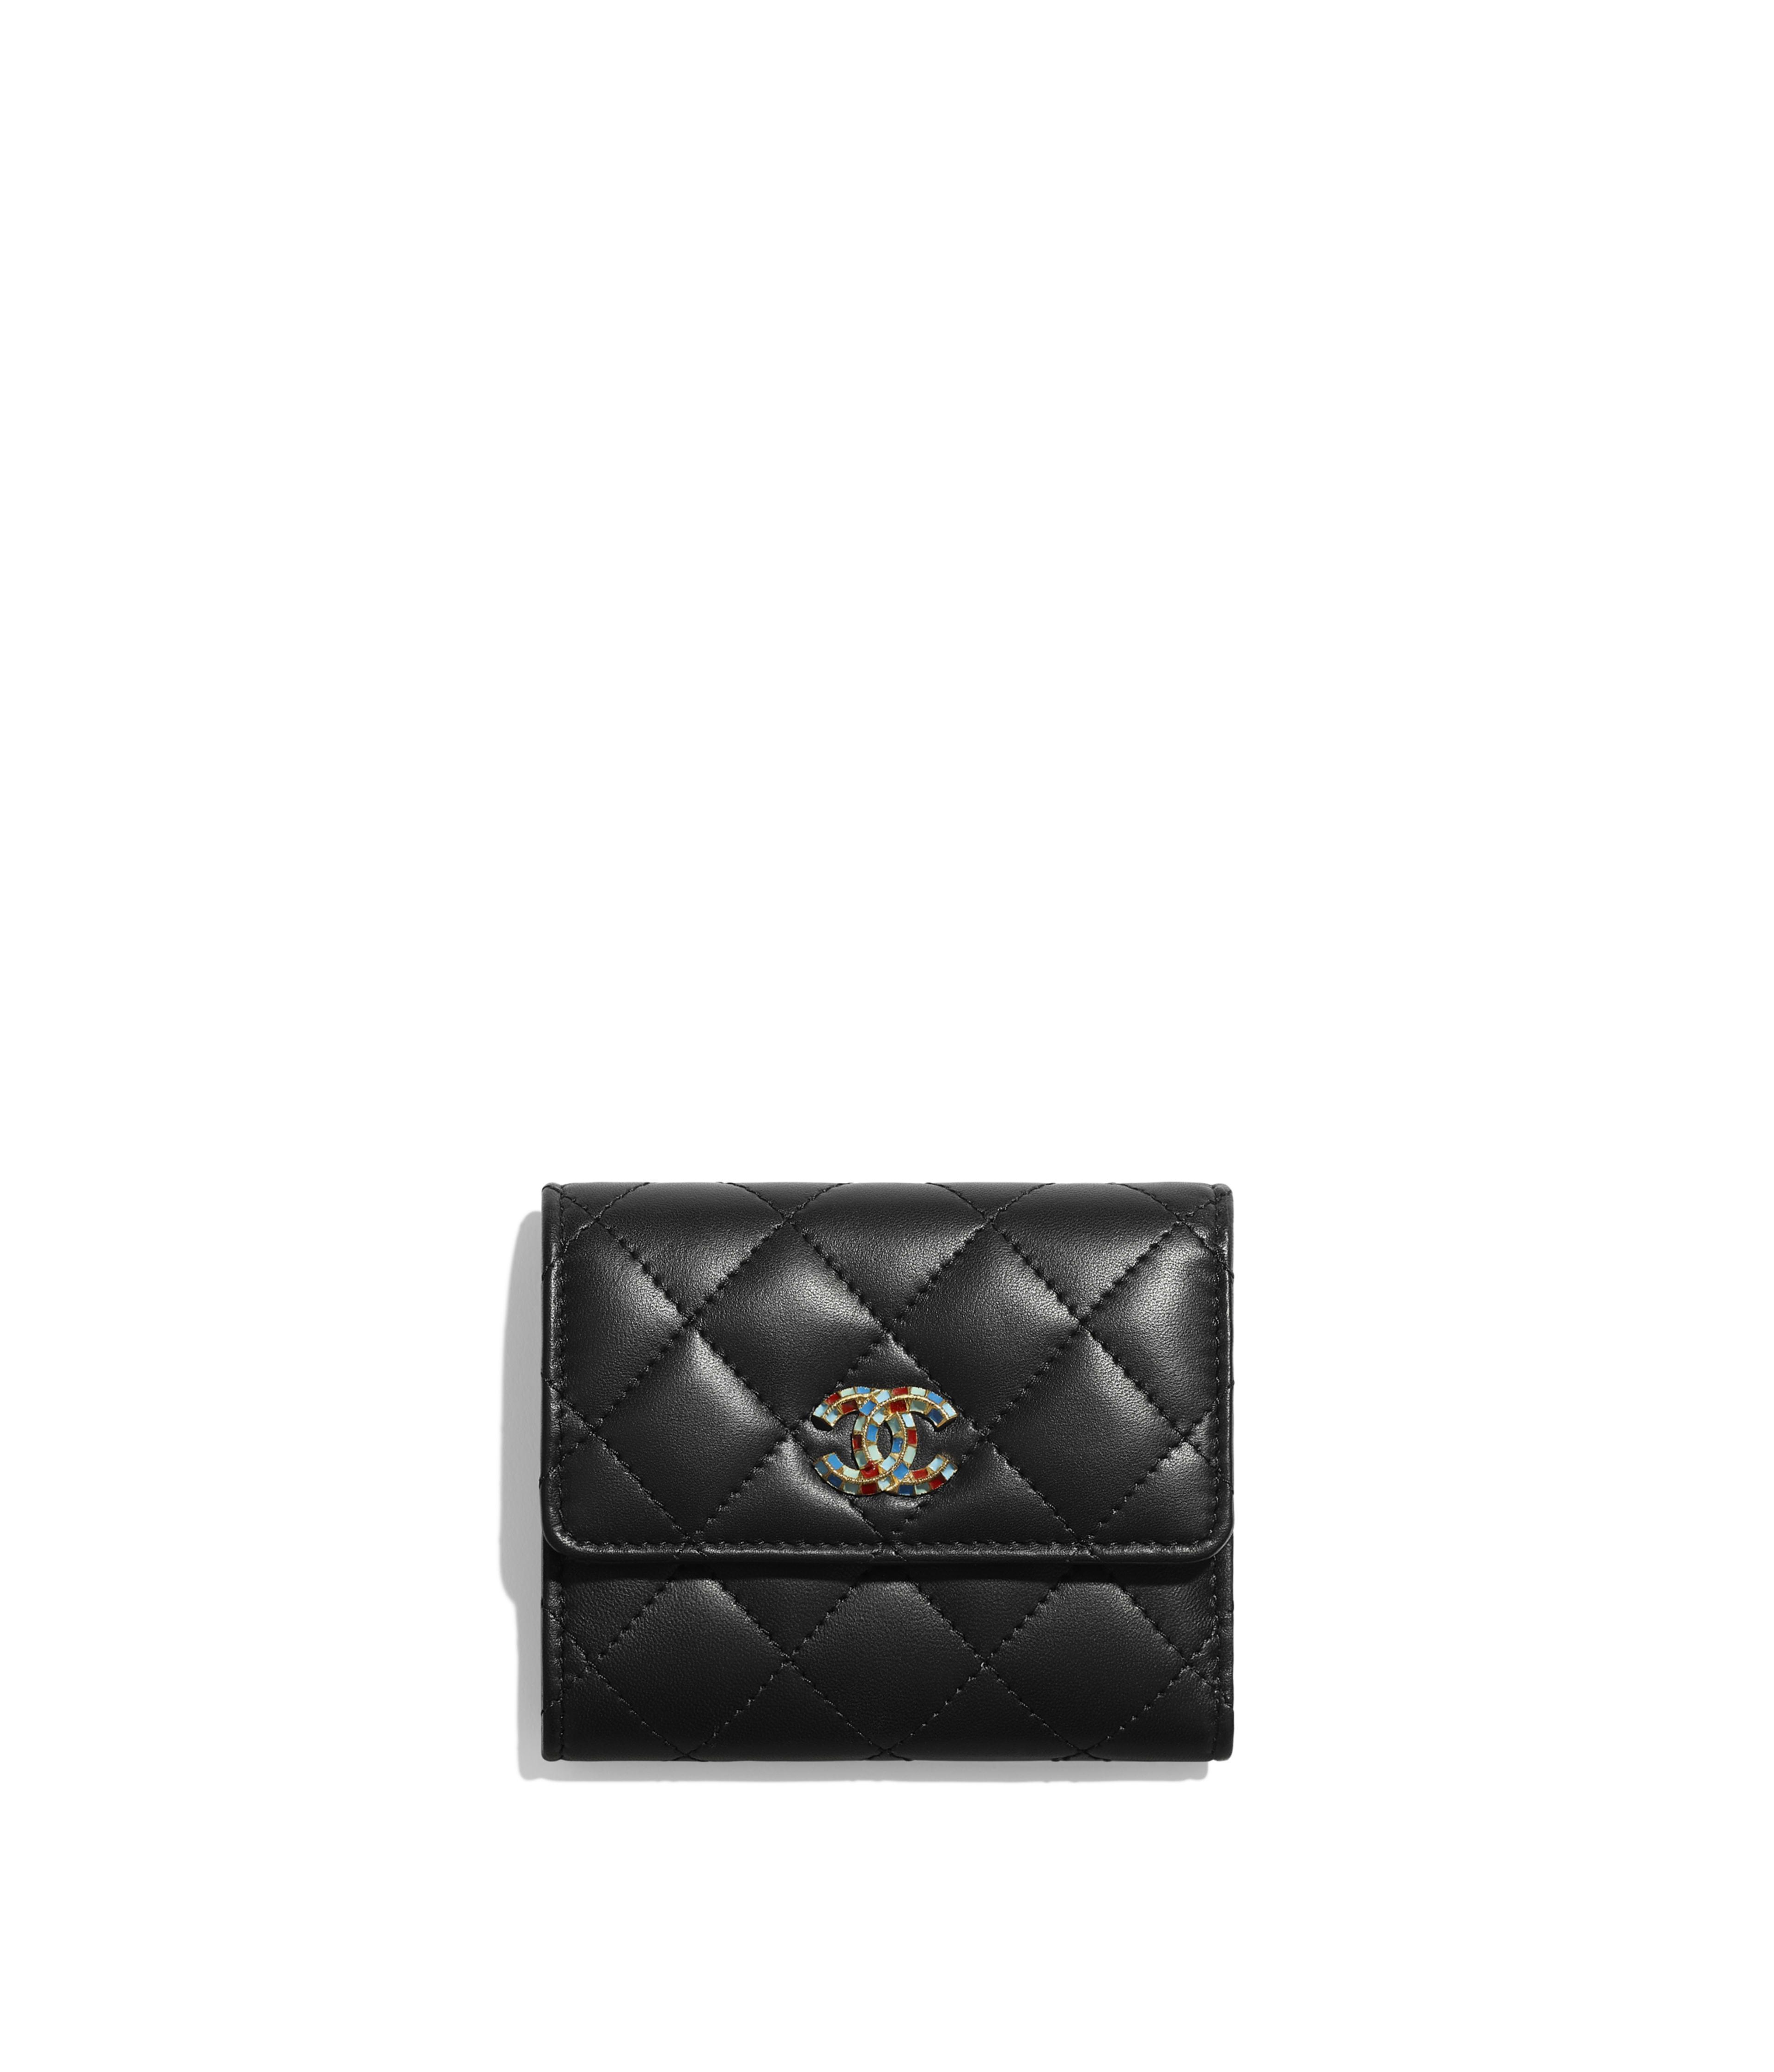 57eba28dae9b Small Flap Wallet Lambskin & Gold-Tone Metal, Black Ref. AP0523B0086694305